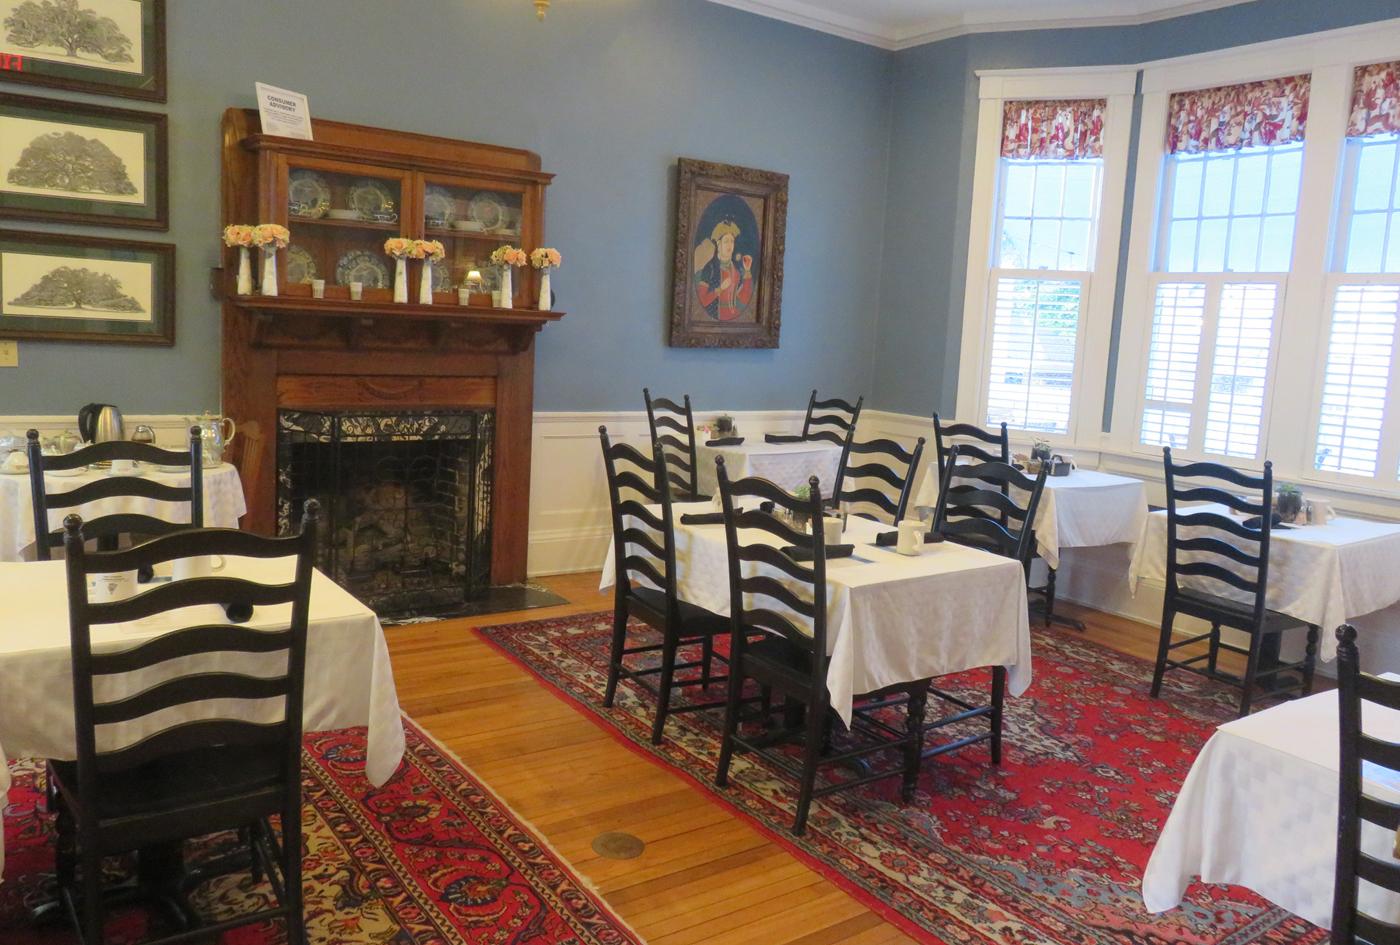 Visiting Jacksonville: The dining room at the Riverdale Inn in Riverside Avondale Park historic district. (Photo: David Blasco)